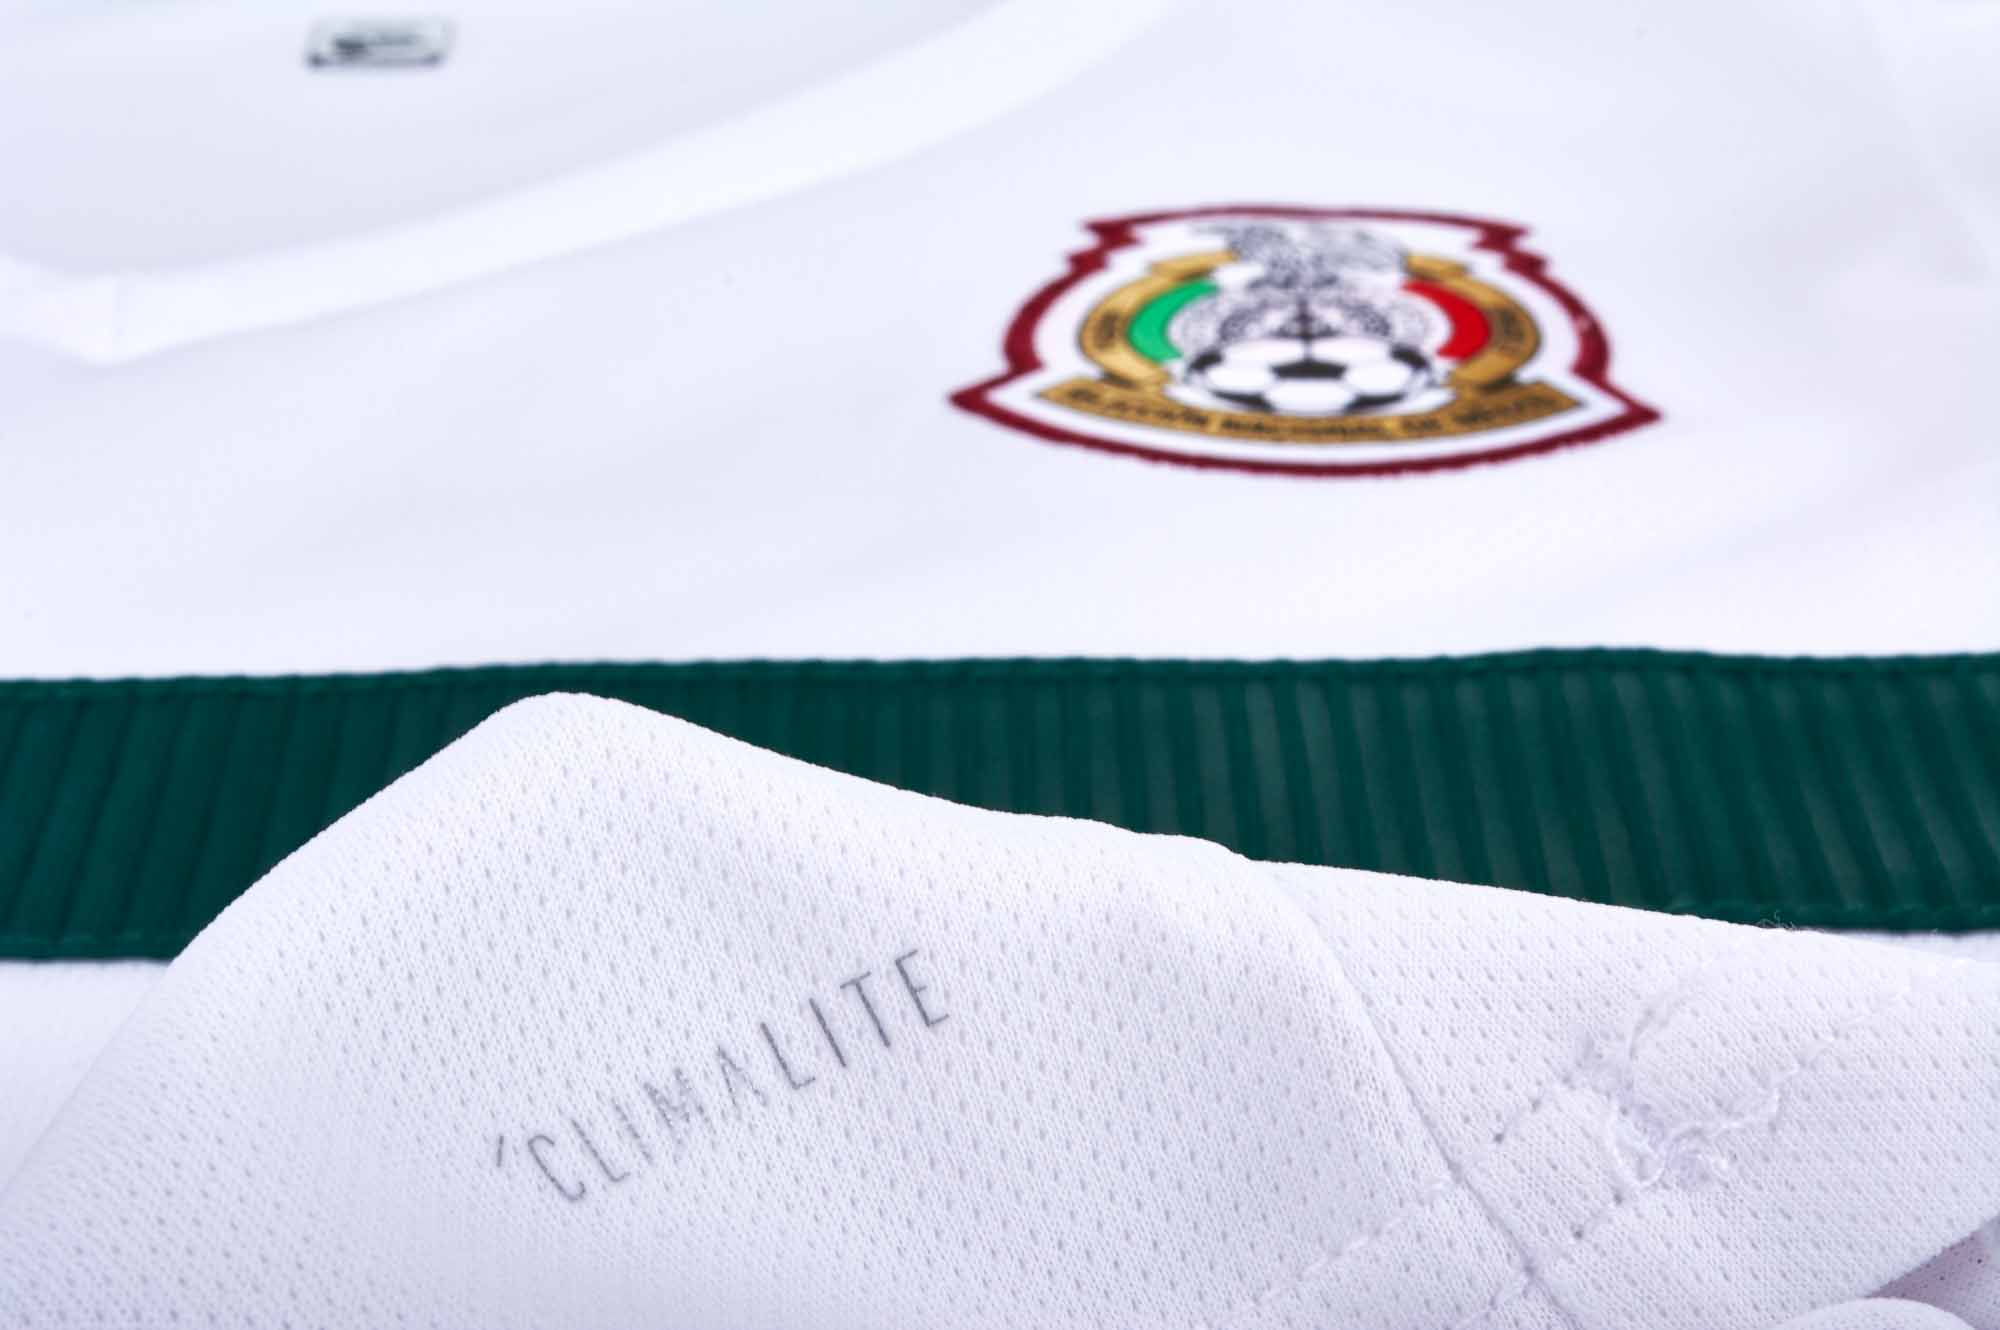 adidas Mexico Away Jersey - Womens 2018-19 - SoccerPro.com 4ca3cbf20